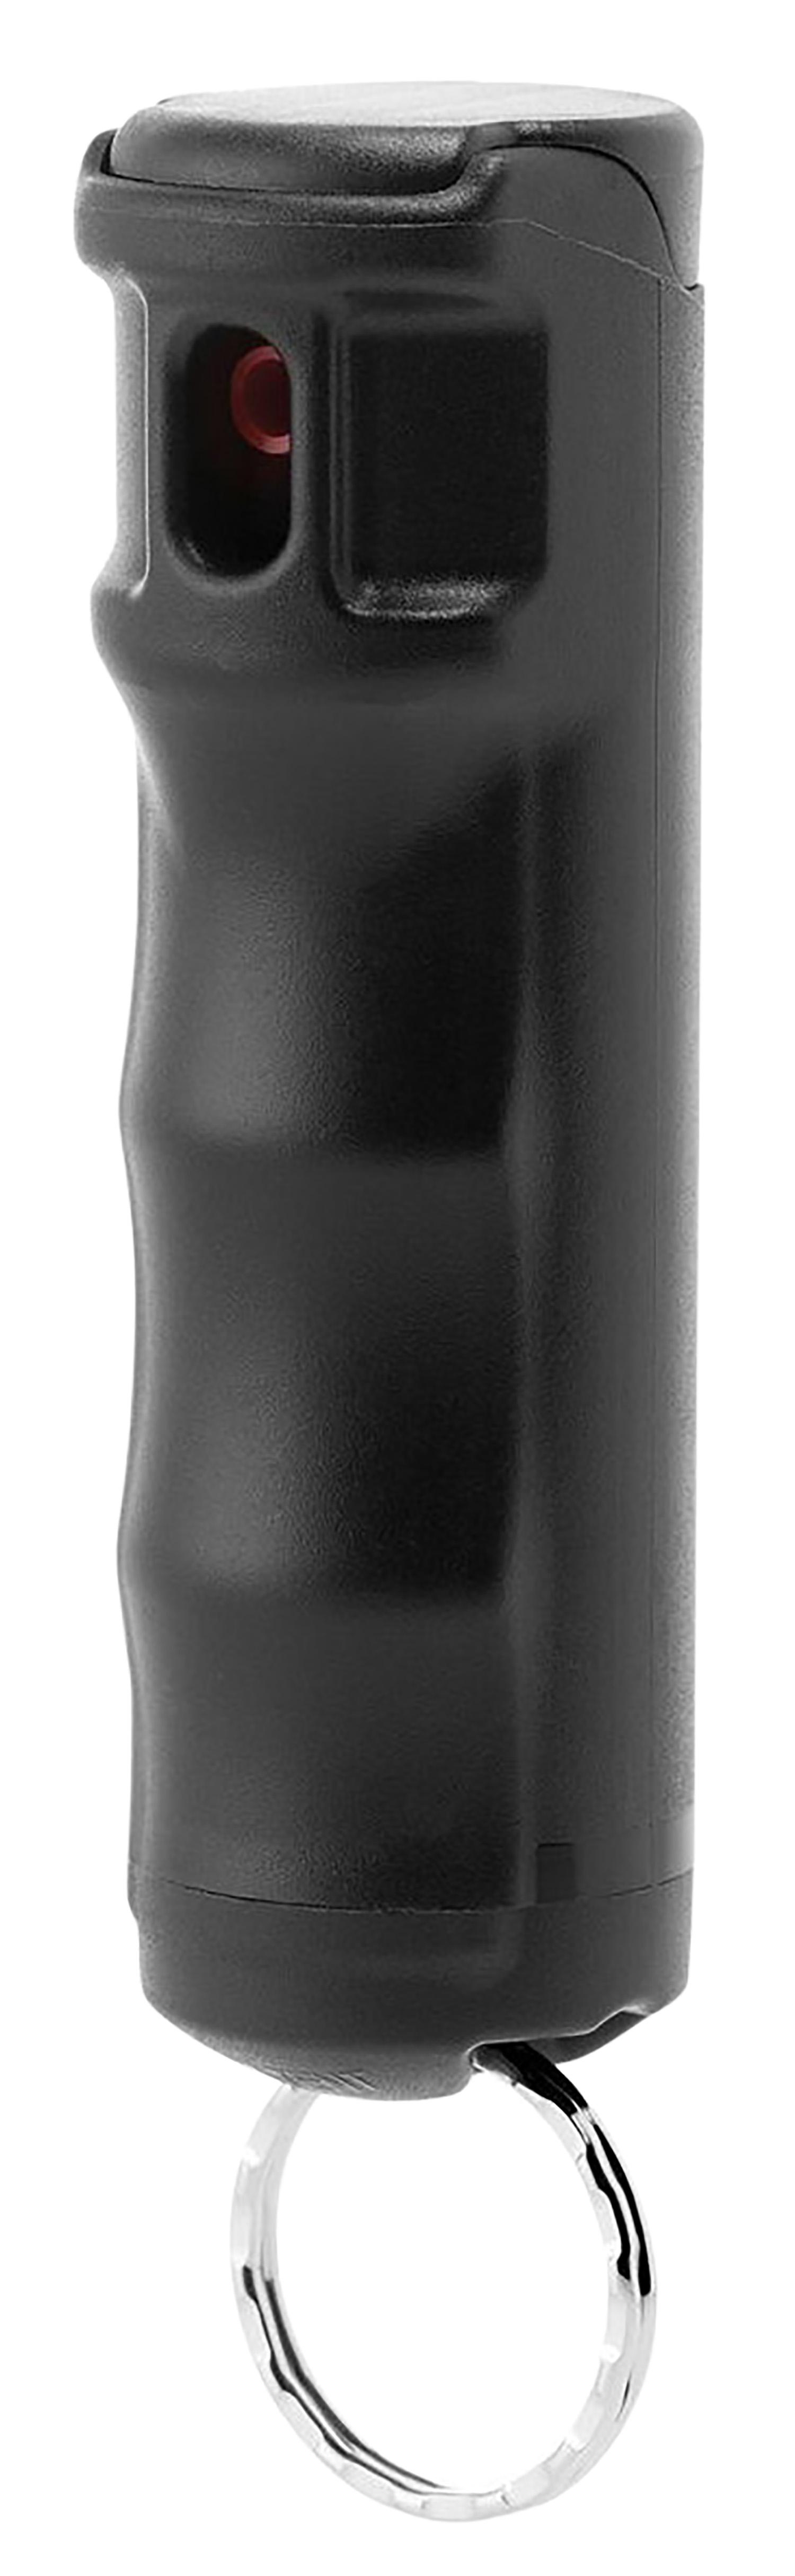 MSI 80785 COMPACT MODEL PEPPER SPRAY 12G BLACK